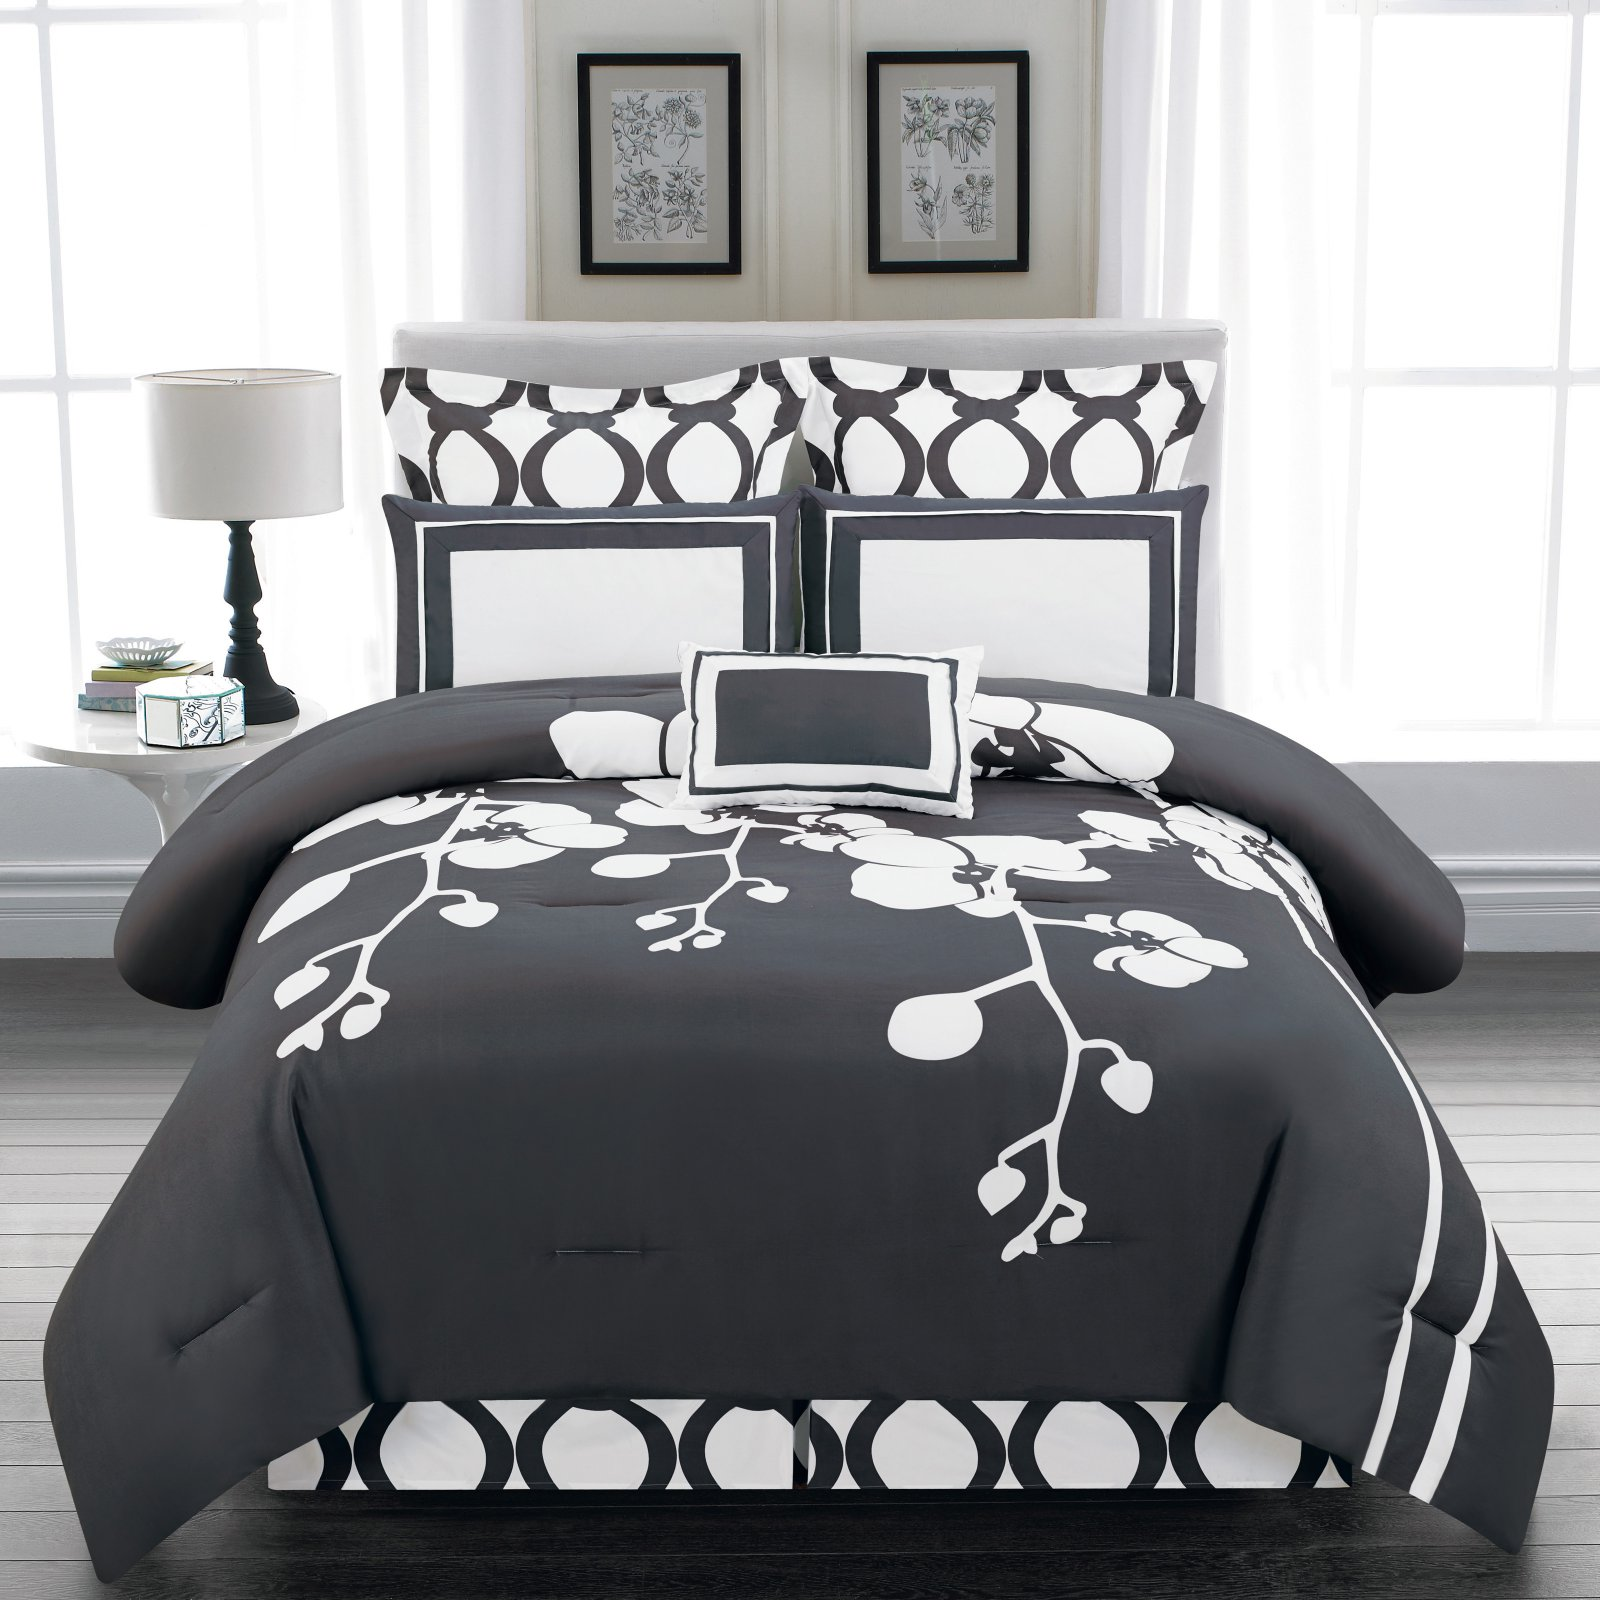 April Orchidea Flower 6 Piece Reversible Oversize/Overfilled Comforter Set by Duck River Textiles